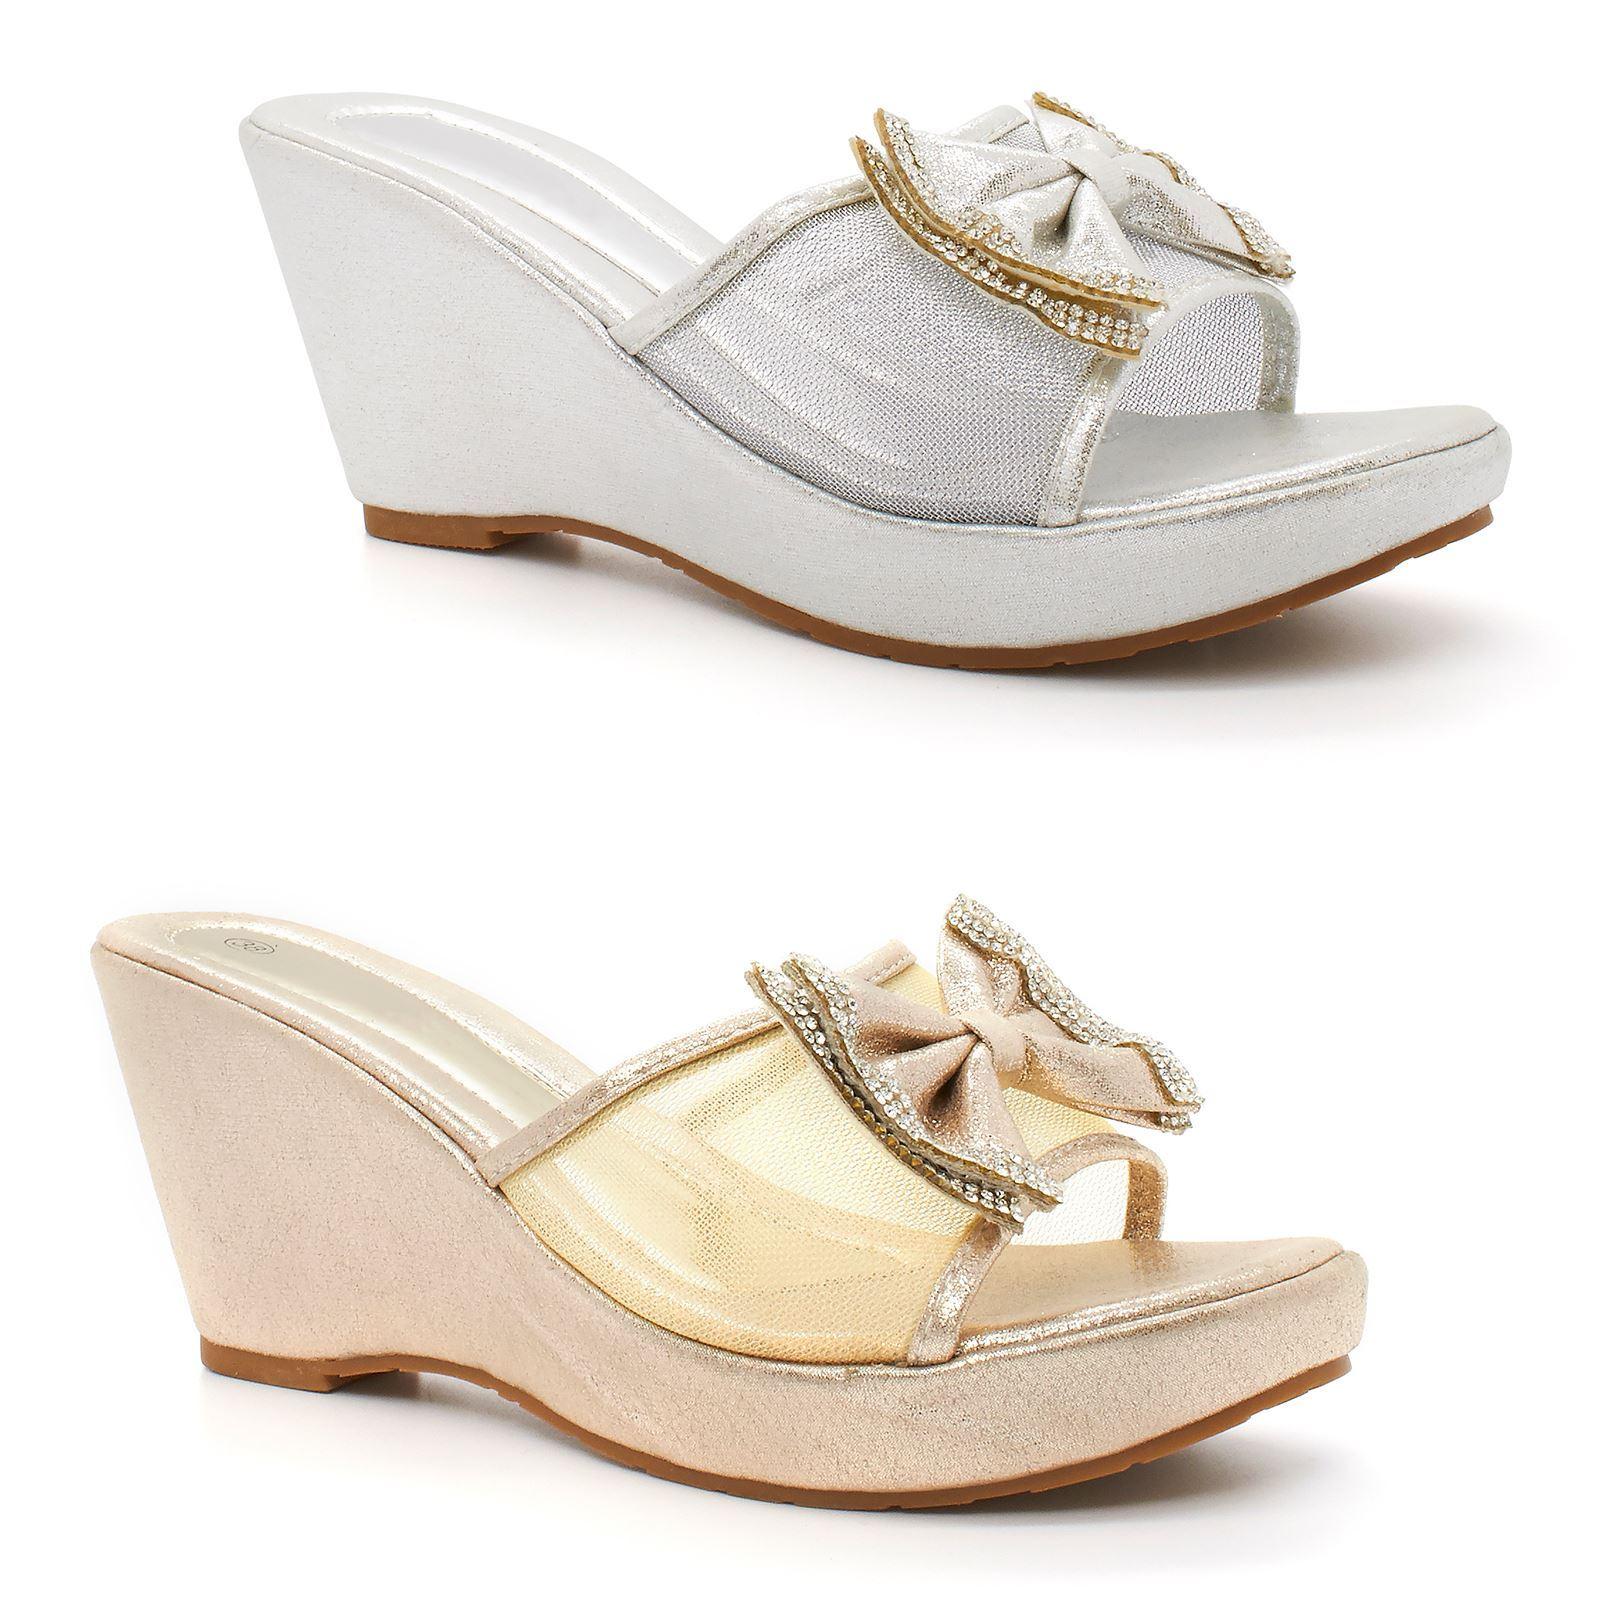 d769481c249 Womens Lades Summer Beach Diamante Wedge Bow Sandals Flip Shoes Size ...